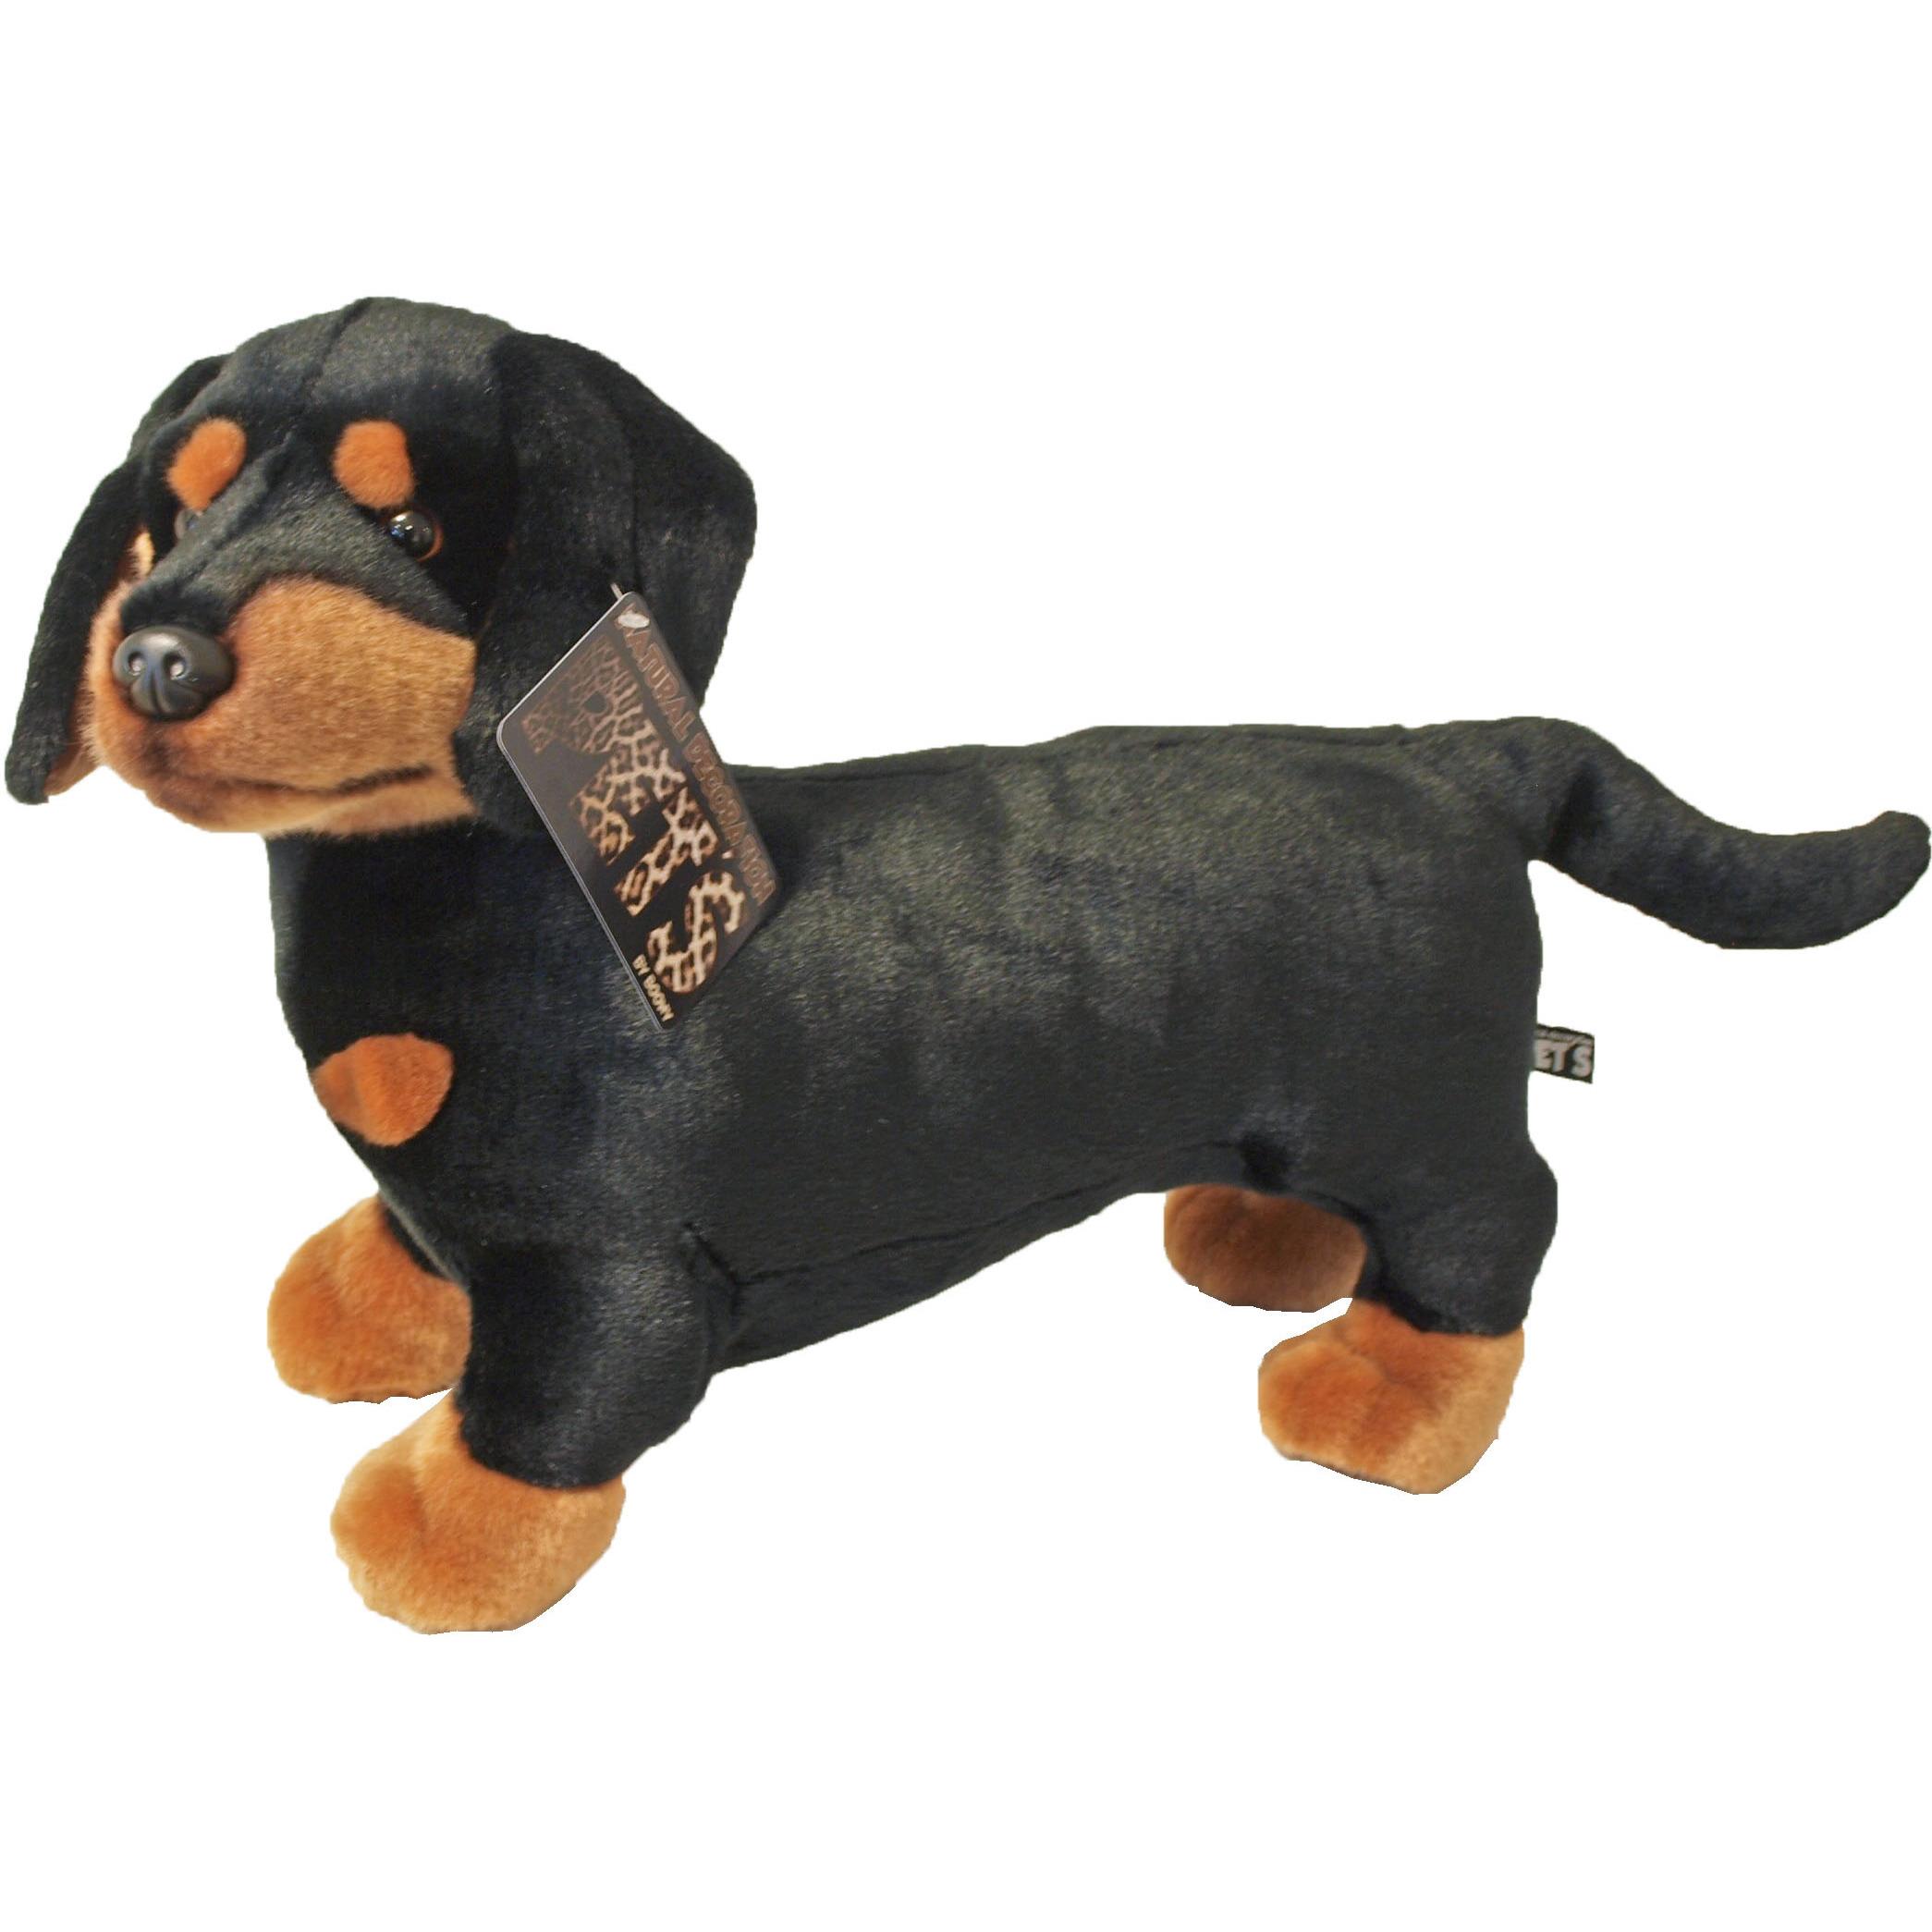 Grote bruin/zwarte honden knuffels 45 cm knuffeldieren